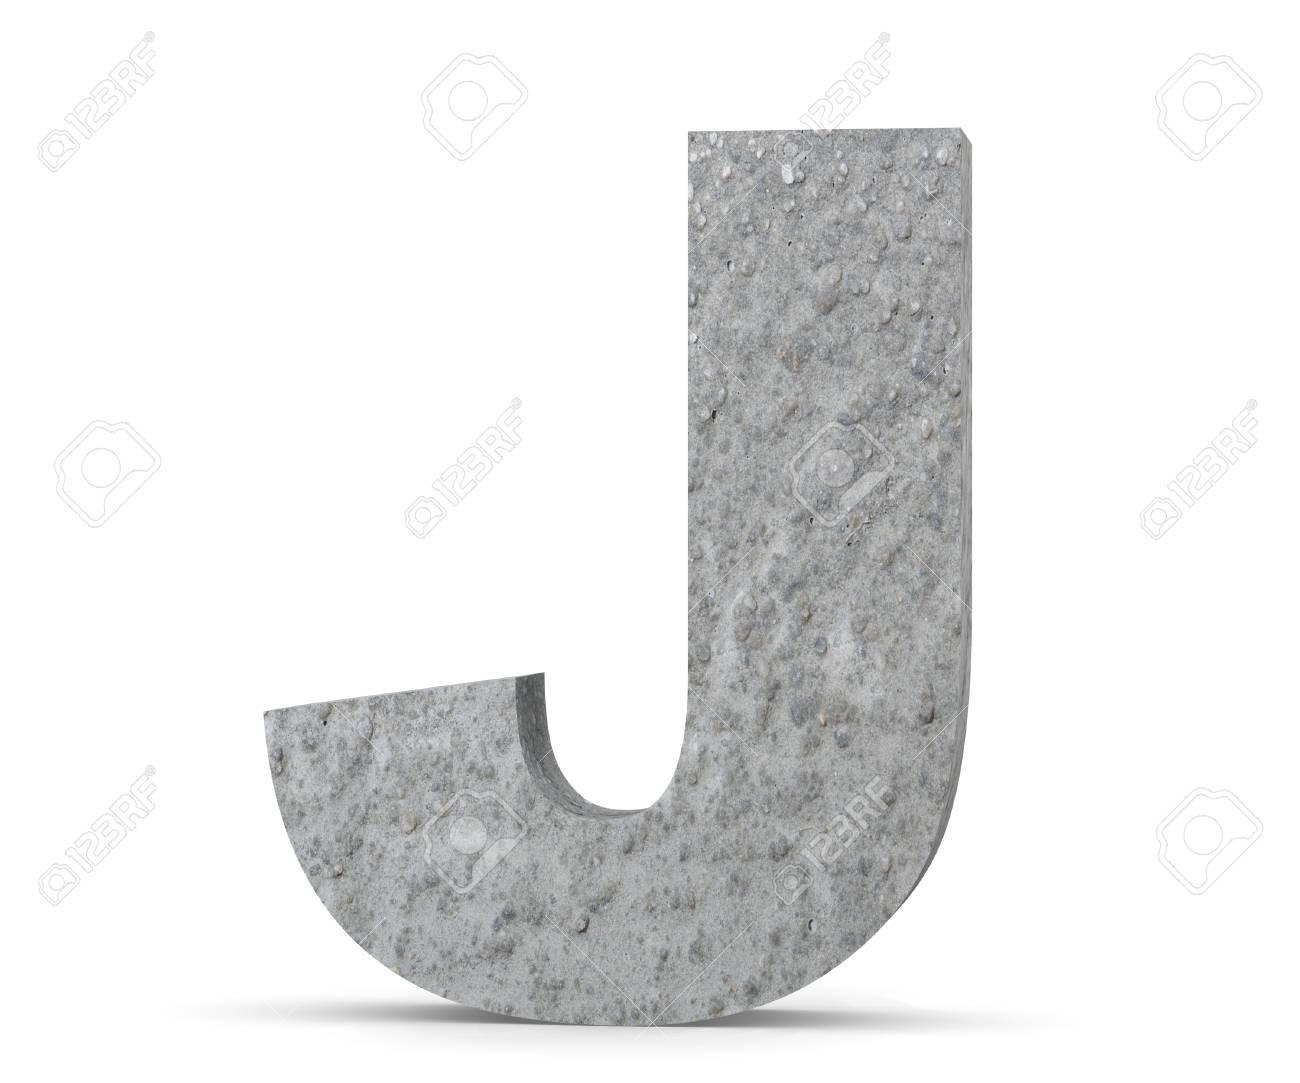 Concrete Capital Letter - J isolated on white background. 3D render Illustration - 118984435